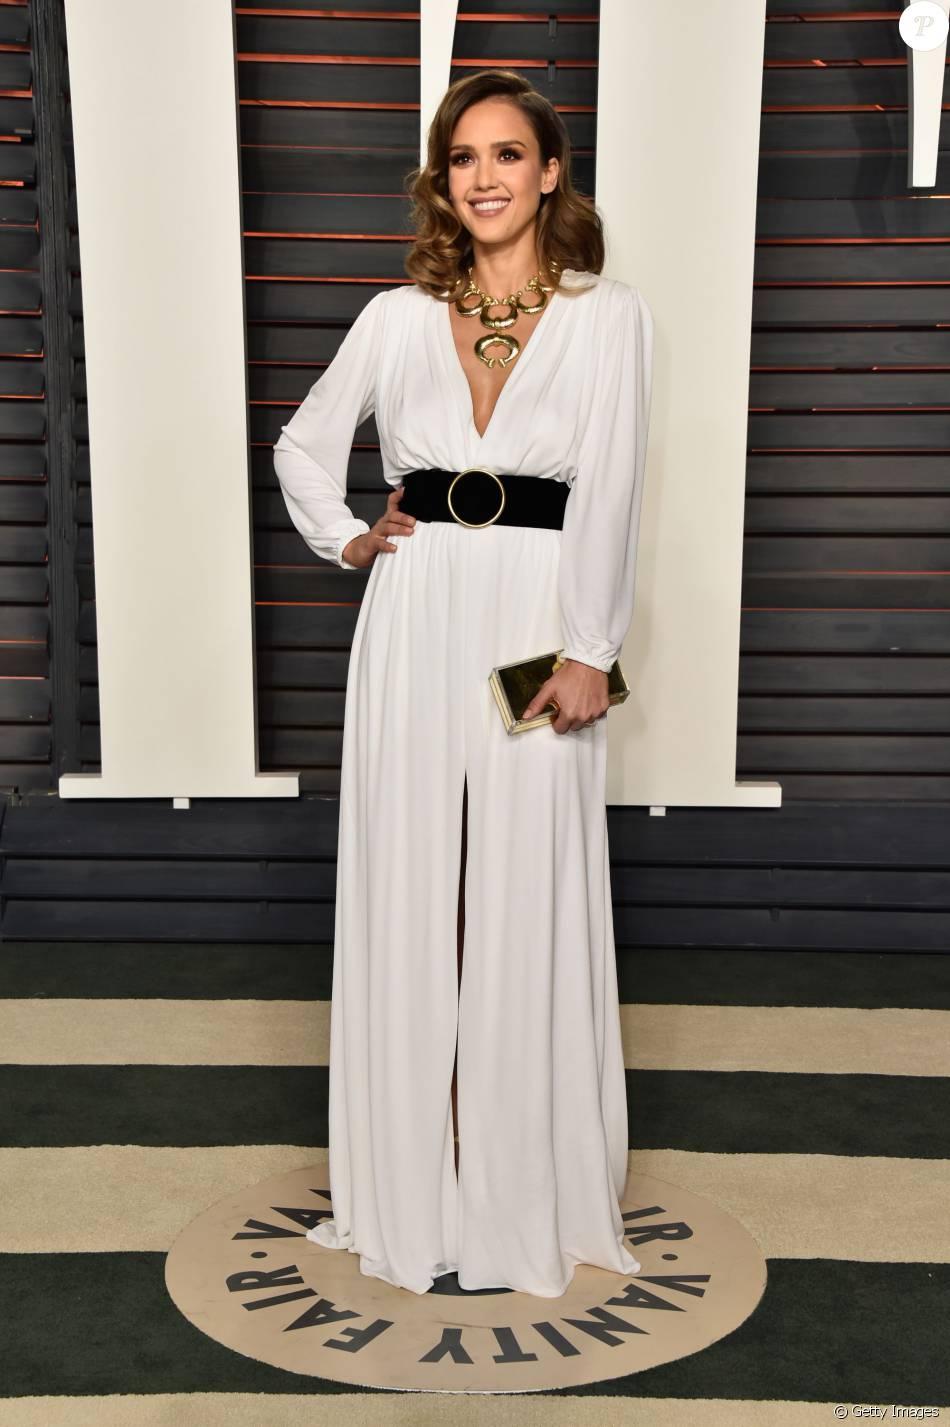 finest selection 29fd4 058a0 Jessica Alba arrasou em vestido Roberto Cavalli na festa pós ...